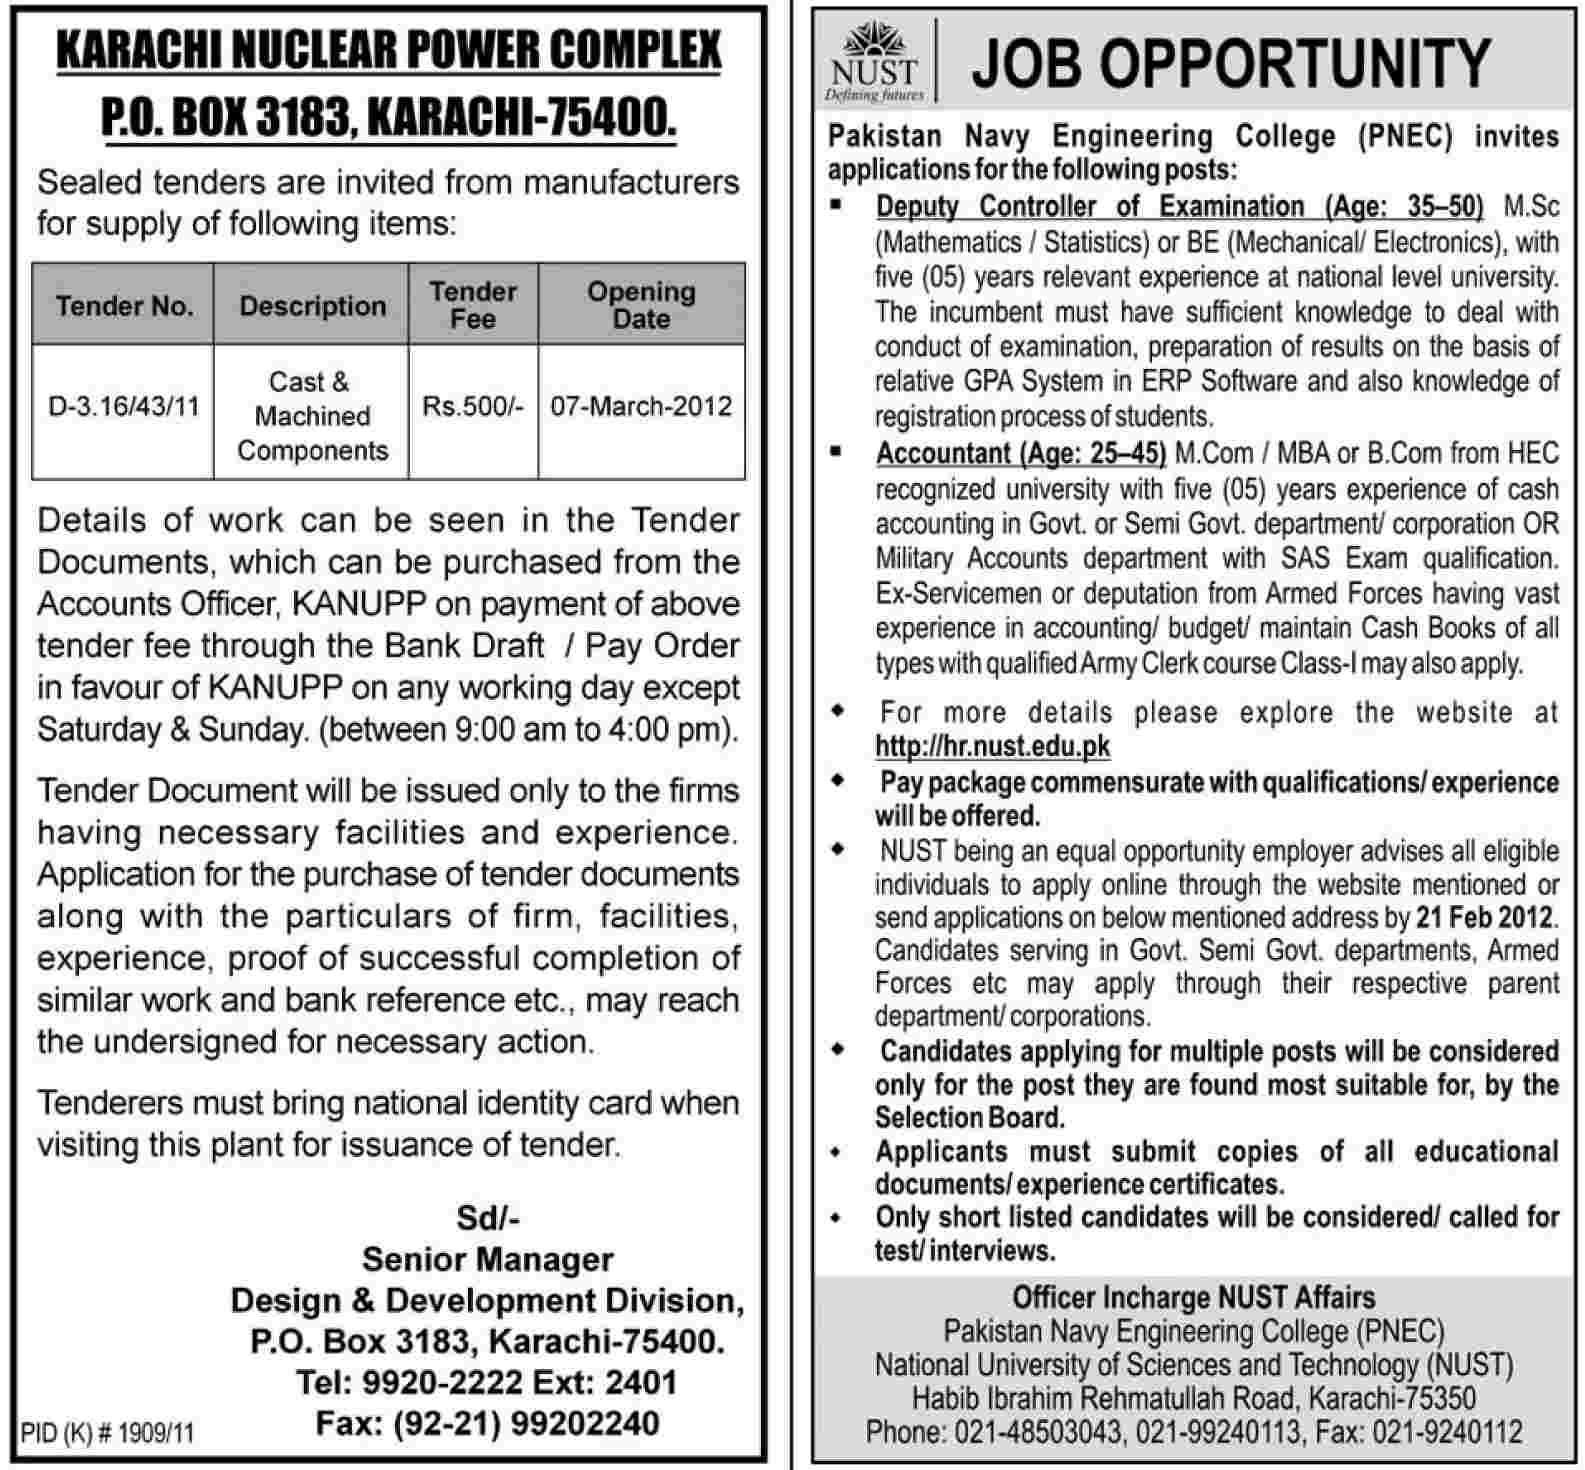 NUST, Pakistan Navy Engineering College (PNEC) Karachi Jobs